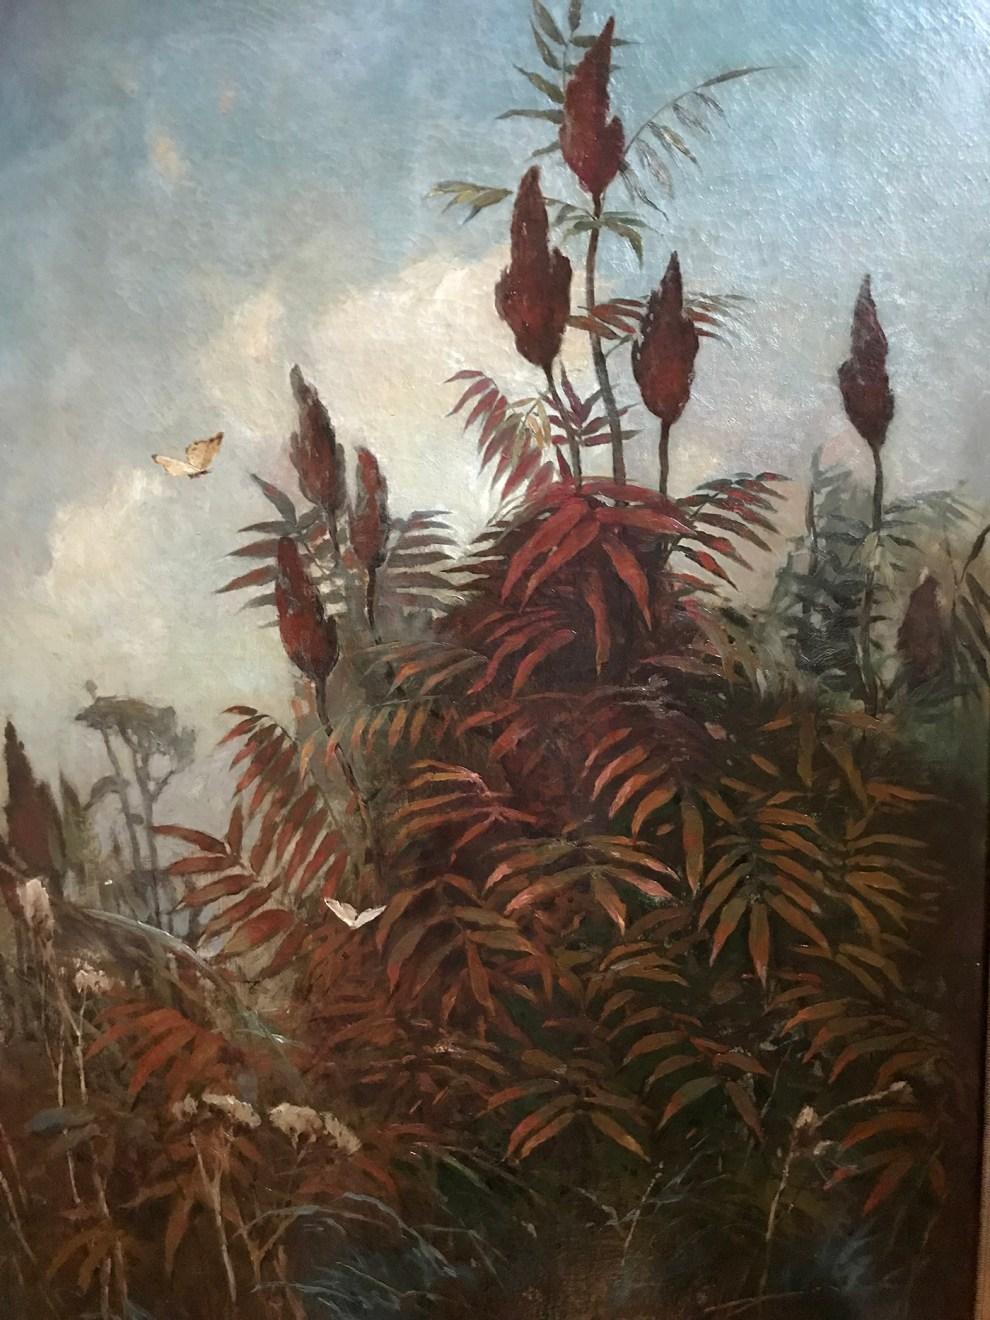 Emil Carlsen : Staghorn sumac, 1883.